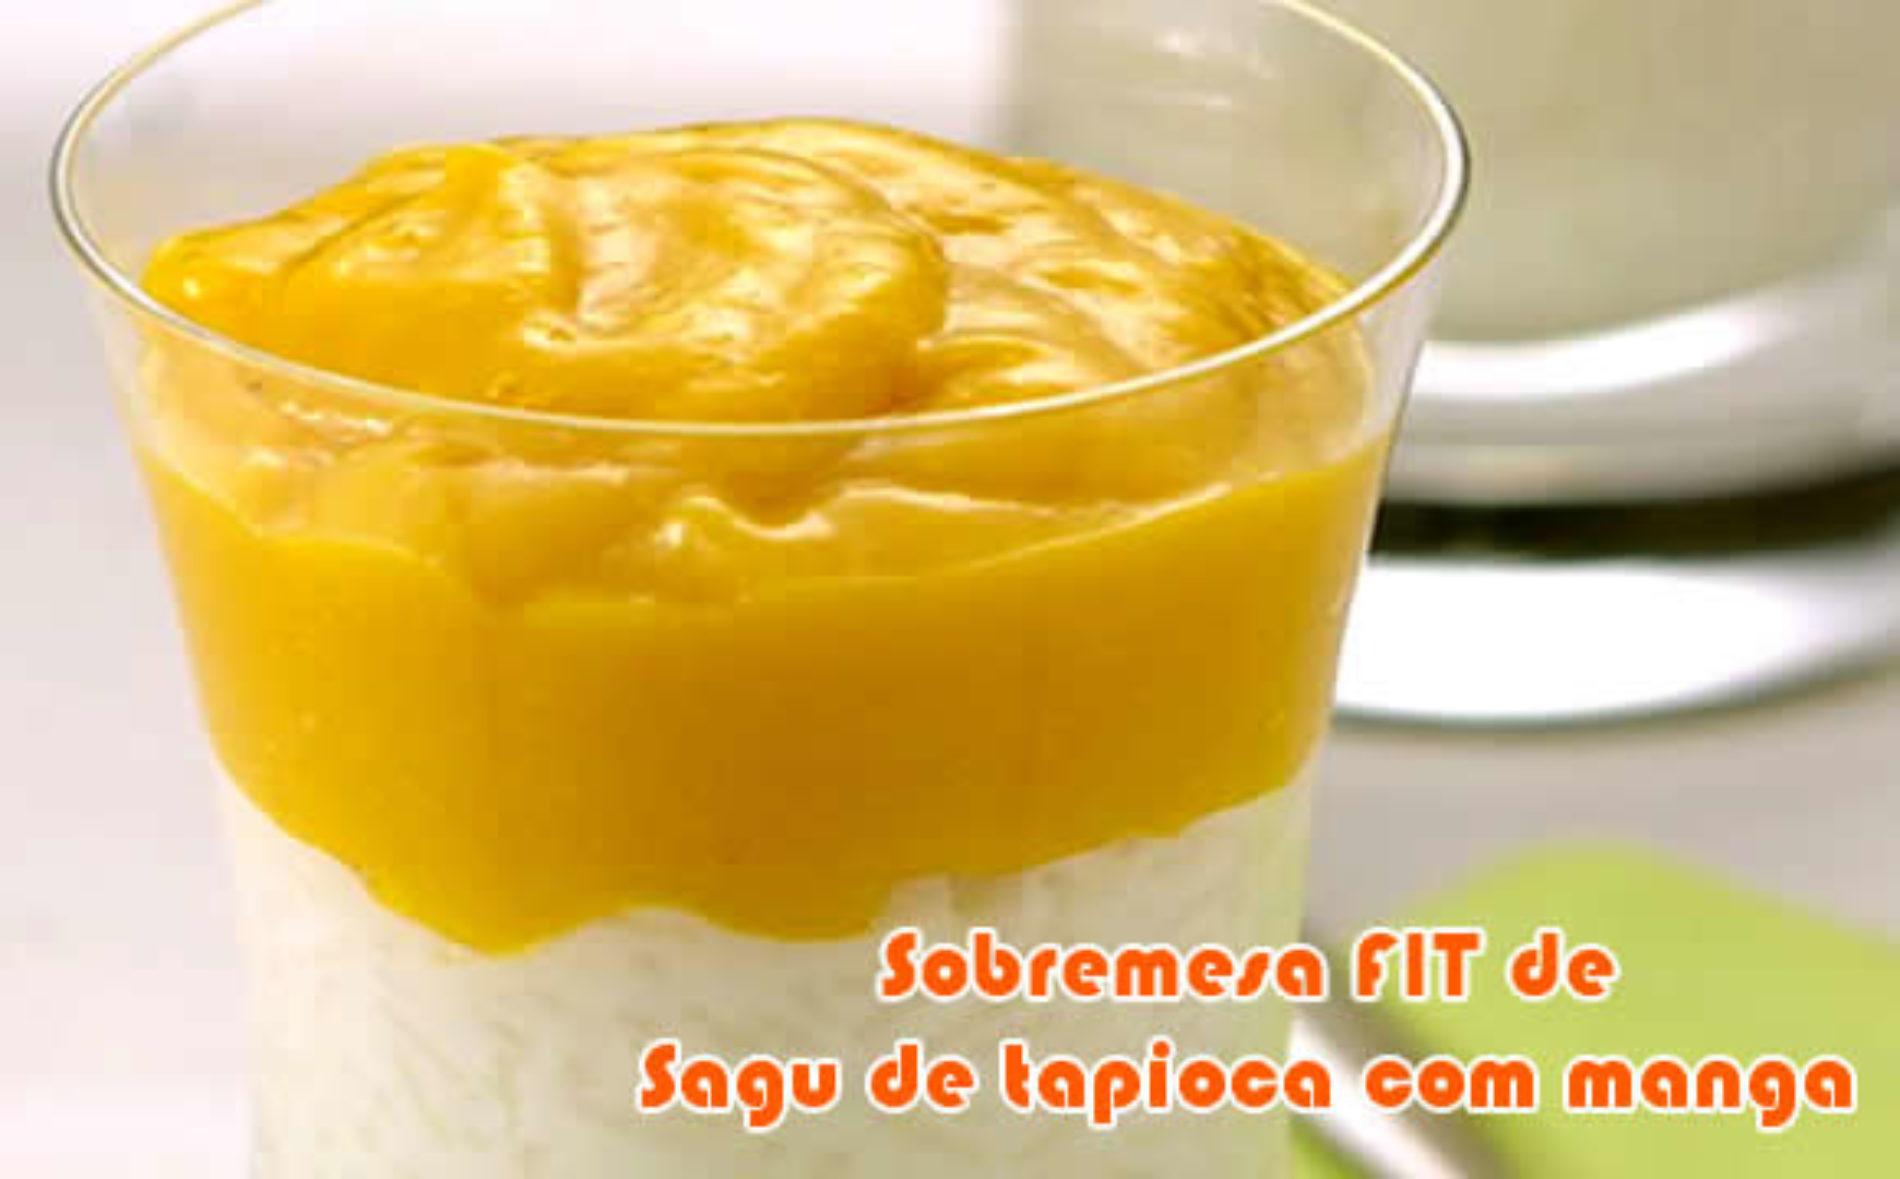 Sobremesa FIT de tapioca com manga